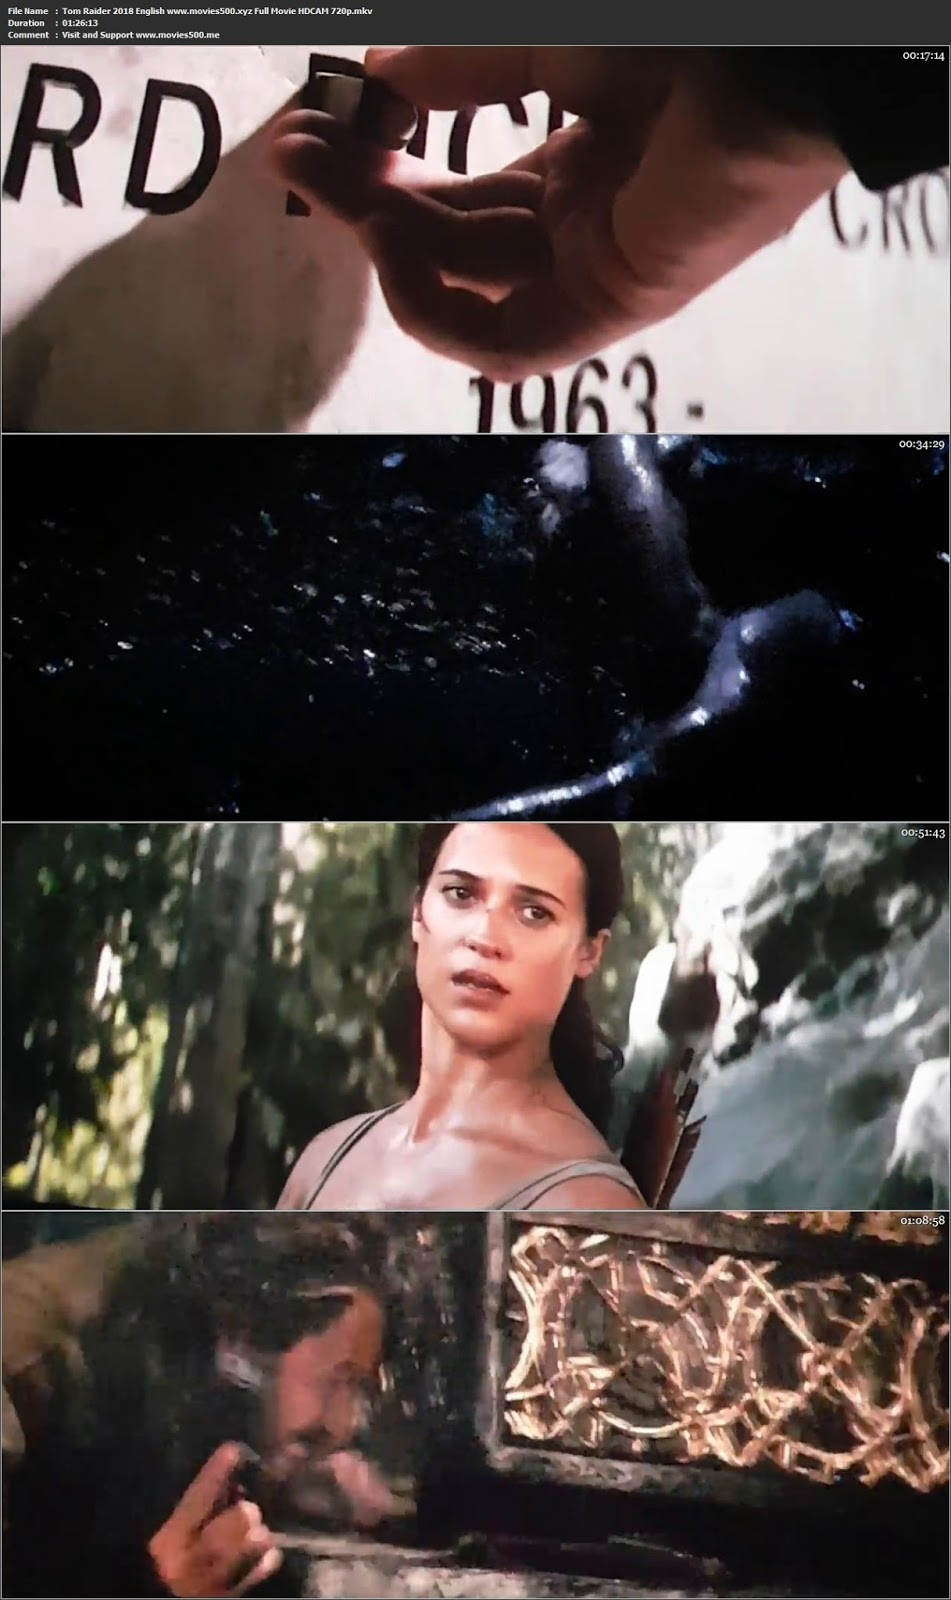 Tomb Raider 2018 English Full Movie HDCAM 720p at 9966132.com